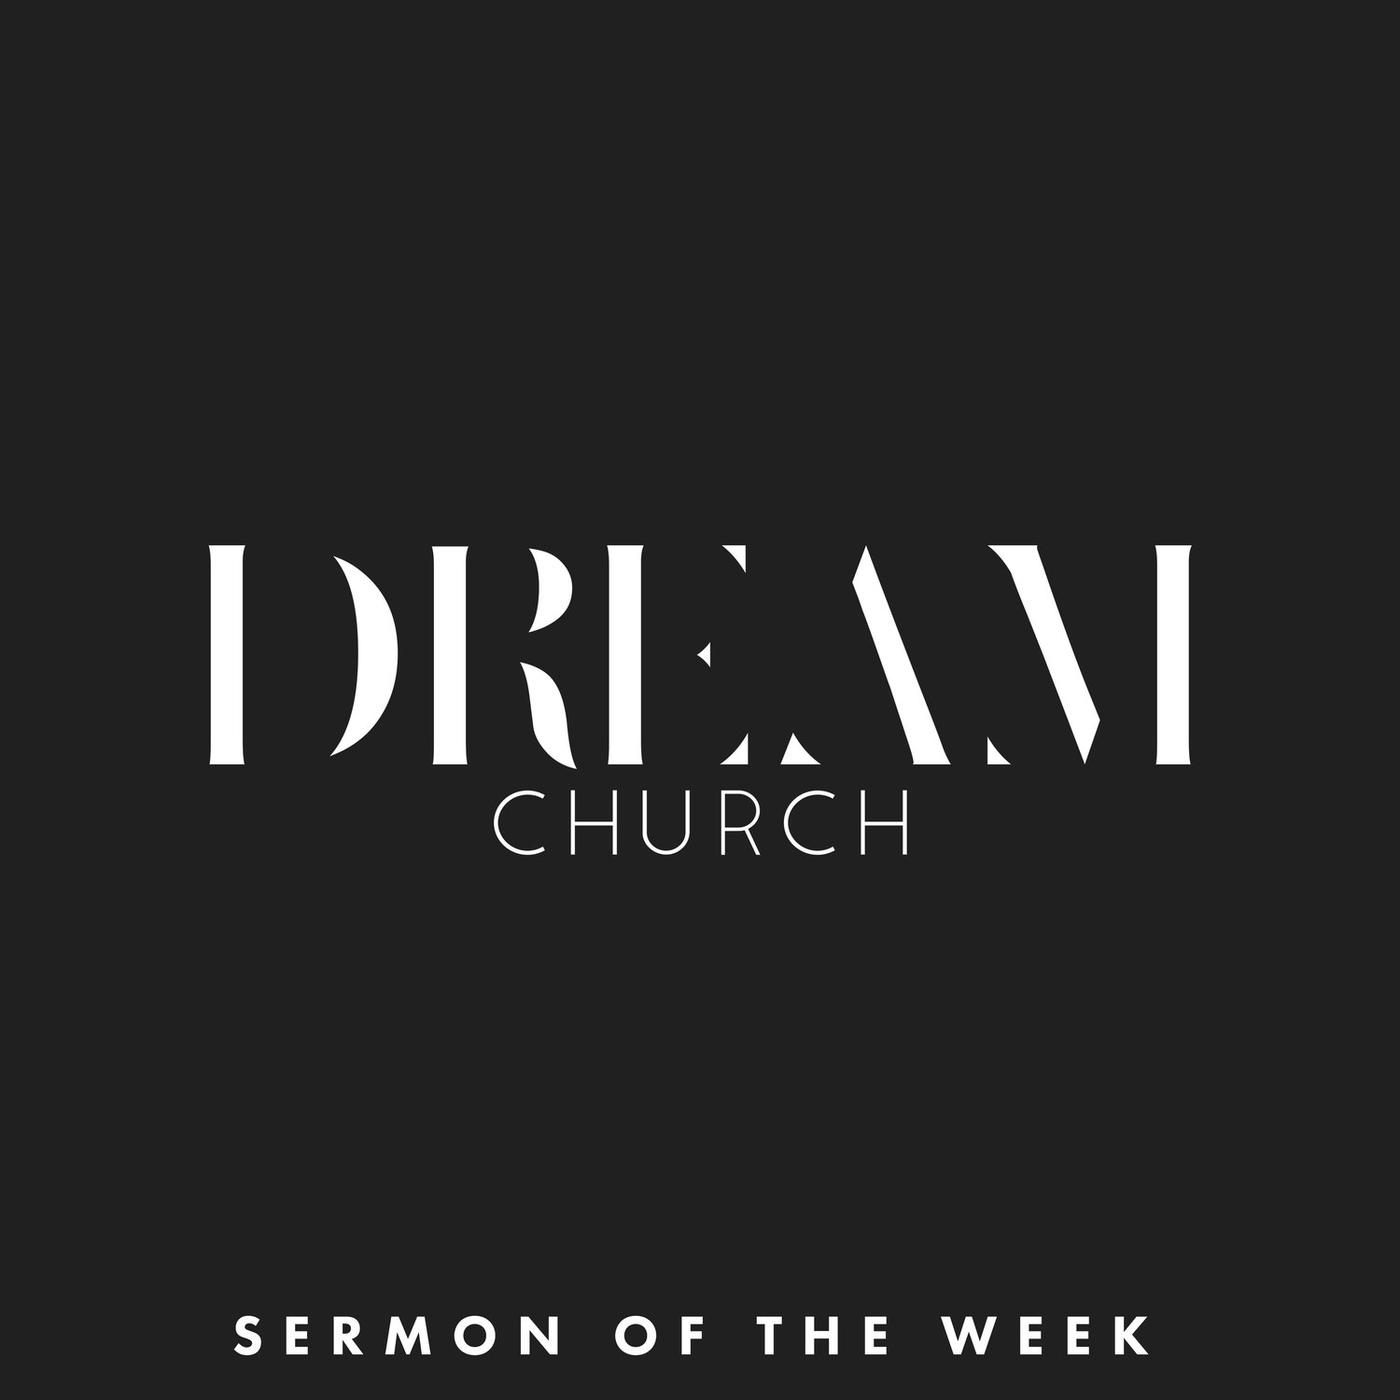 Dream Church Sermon of the Week (podcast) - Joshua Brown